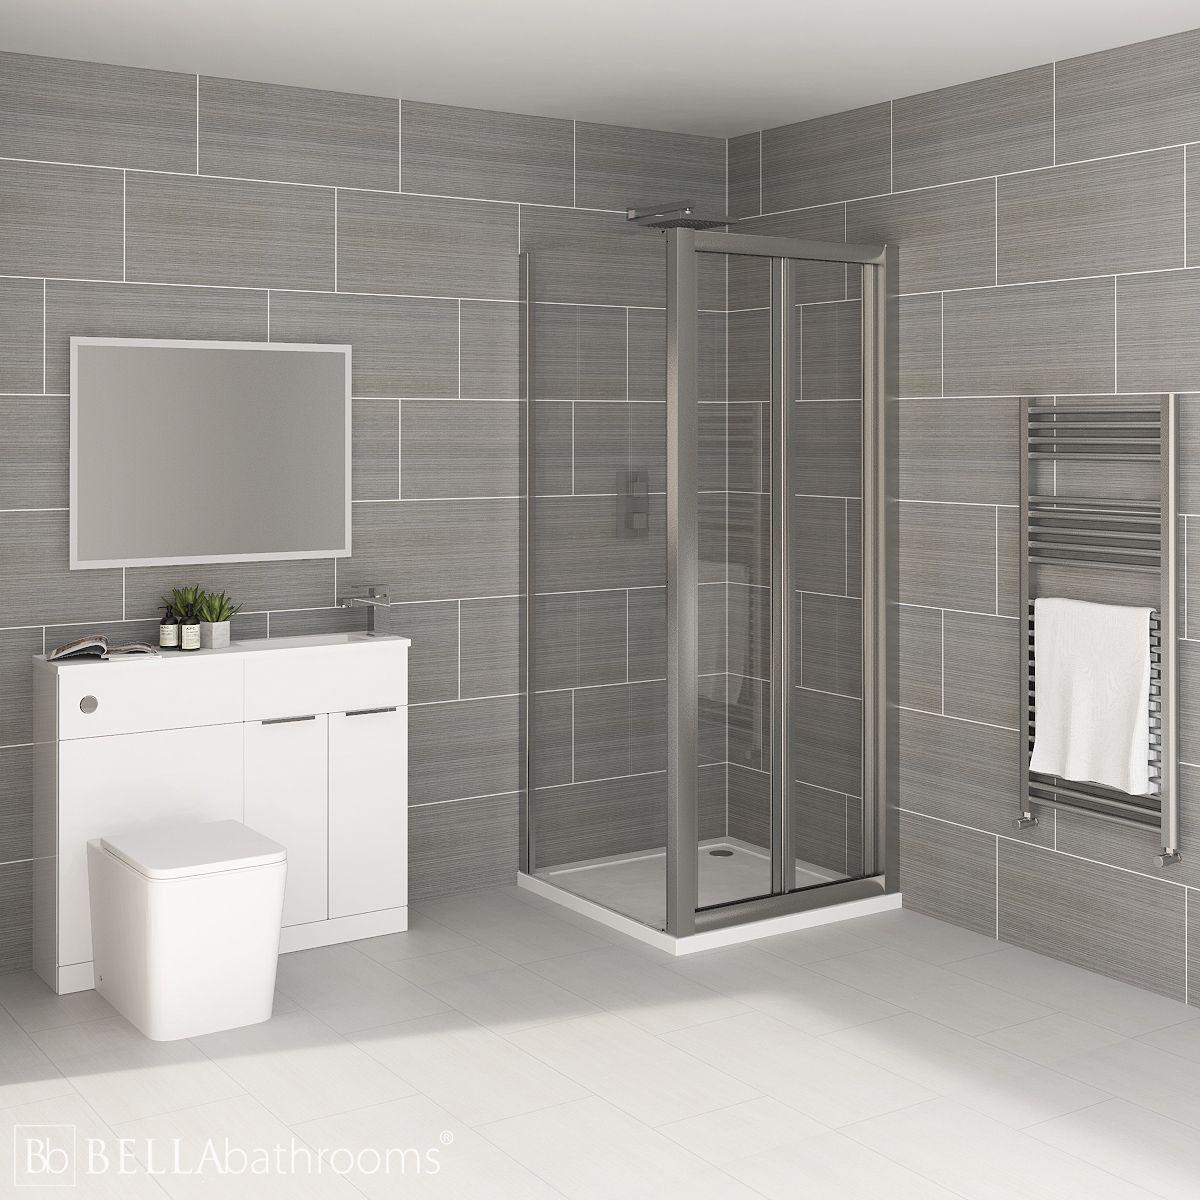 Elation Combination White Furniture Suite with April Destini Bi Fold Shower Enclosure with Brearton Toilet